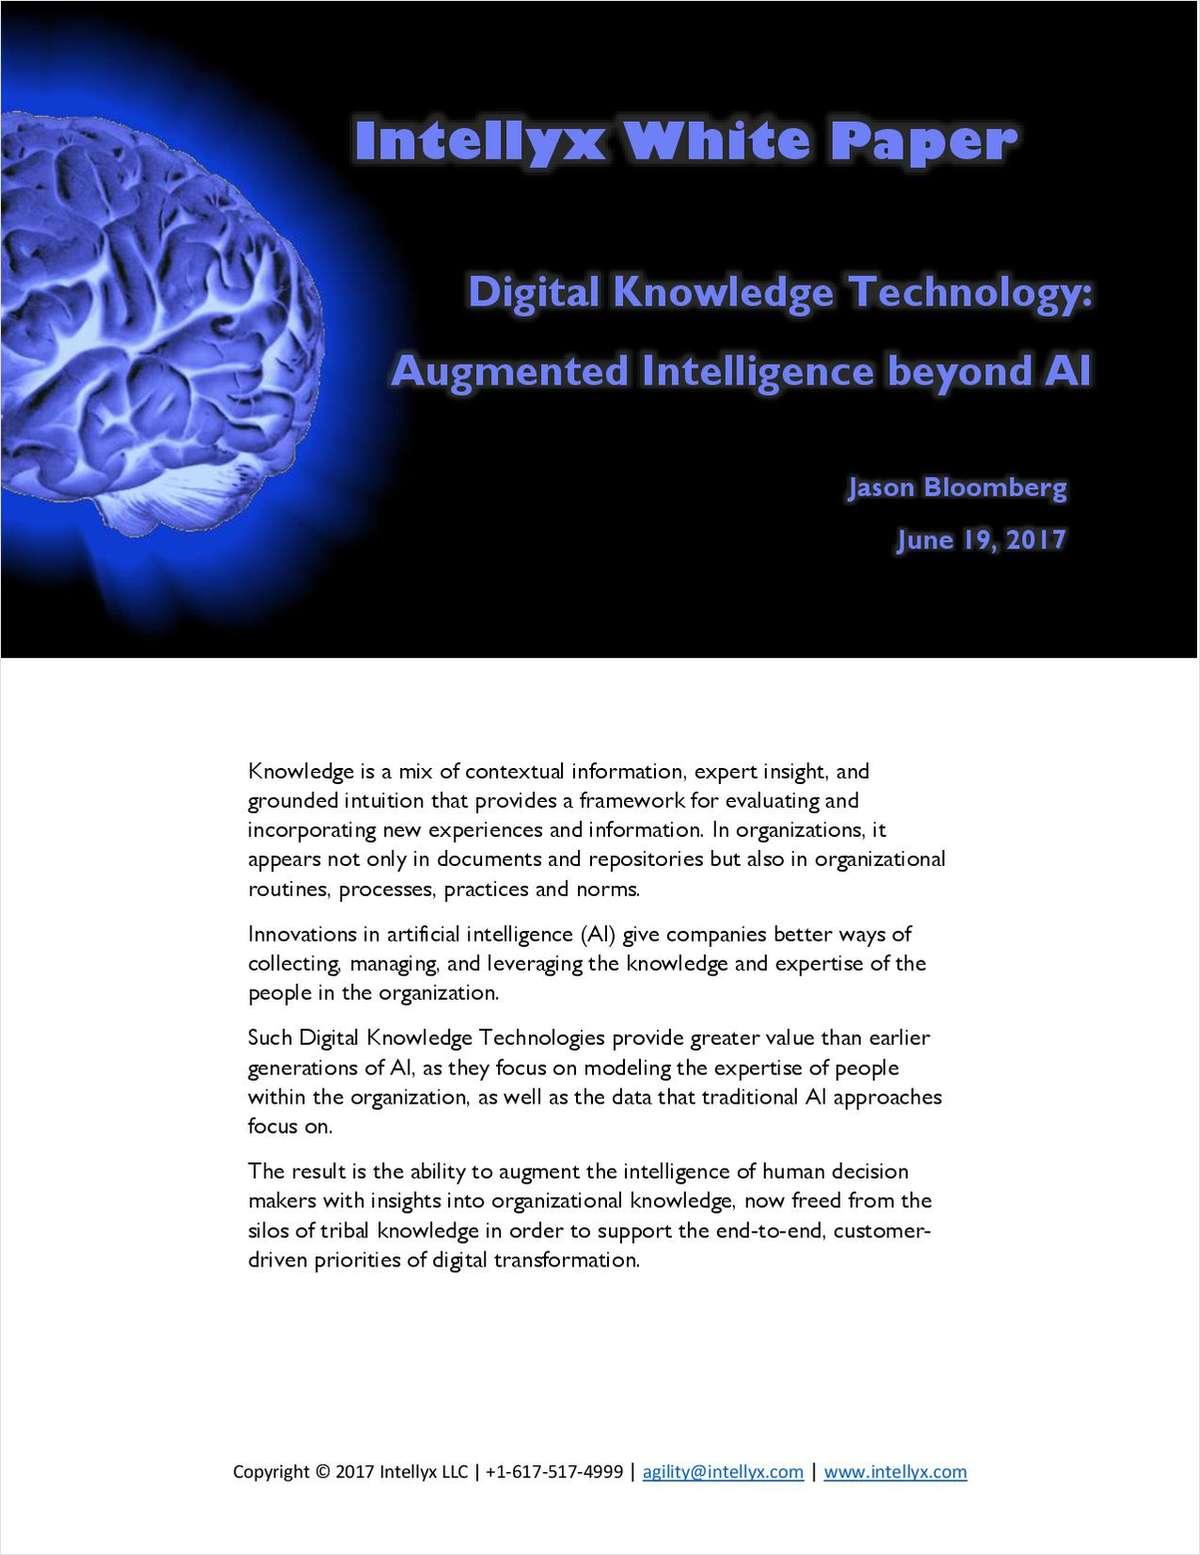 Intellyx: Digital Knowledge Technology: Augmented Intelligence beyond AI